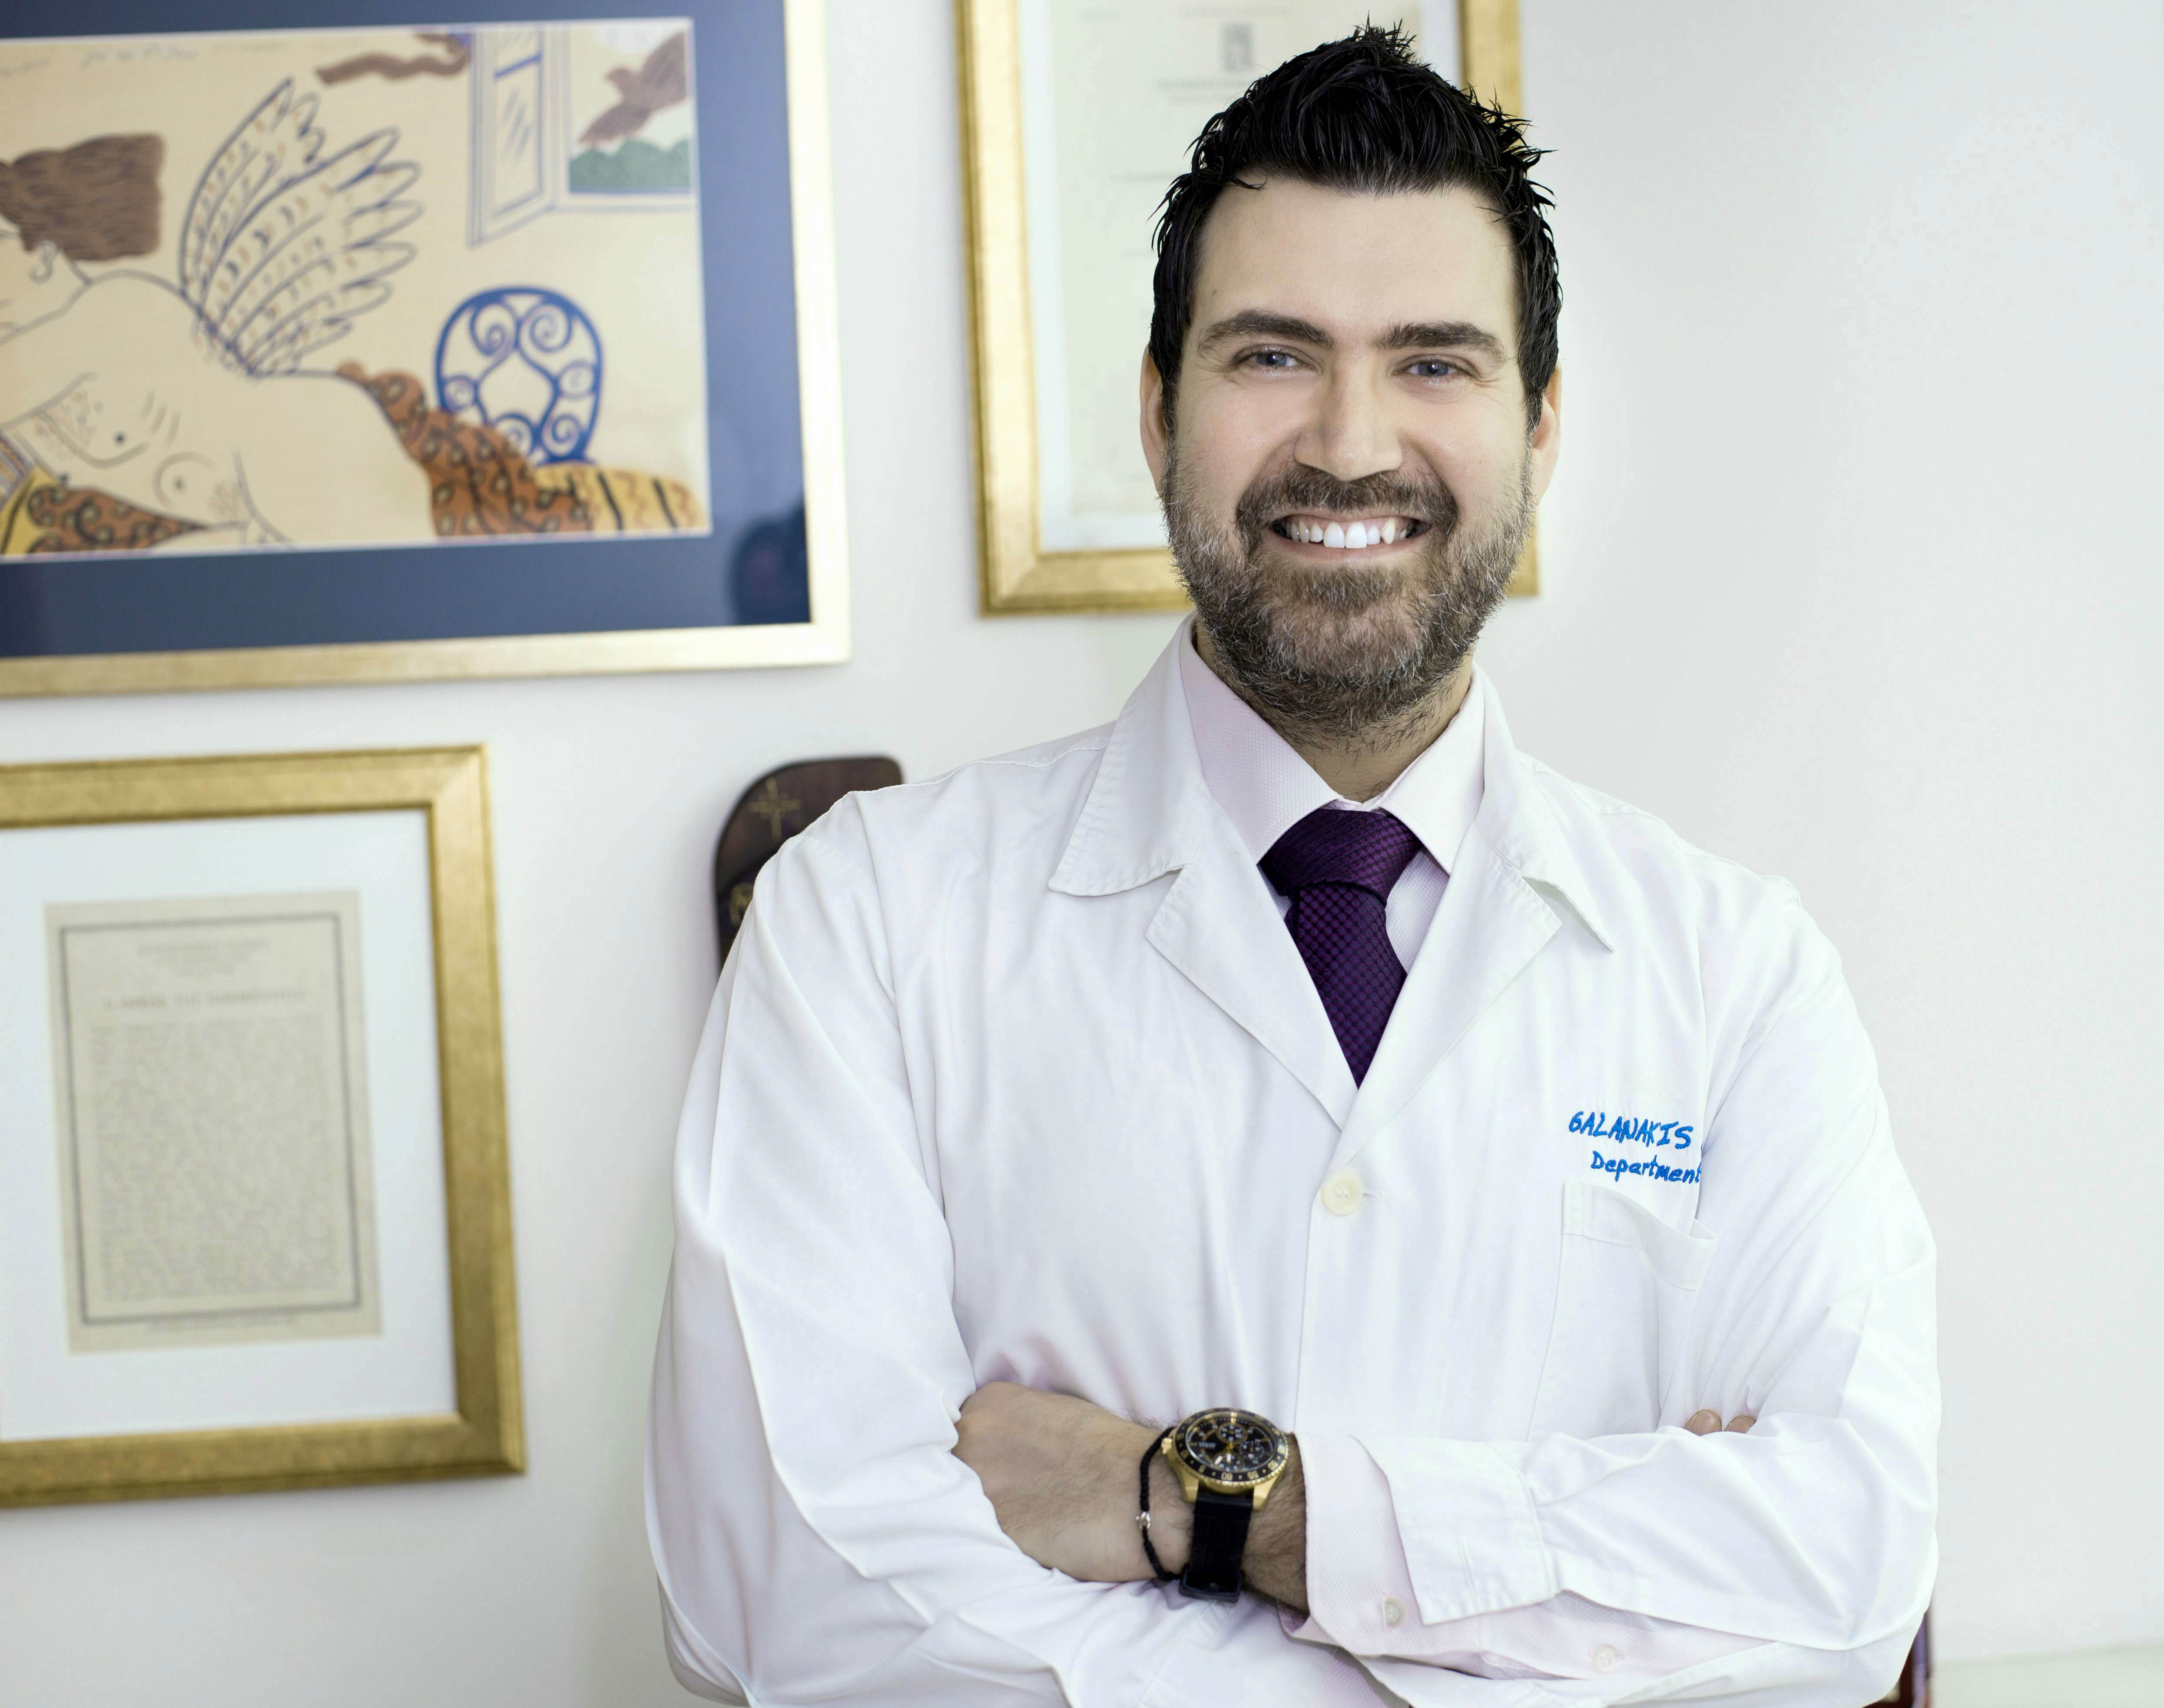 Dr Galanakis